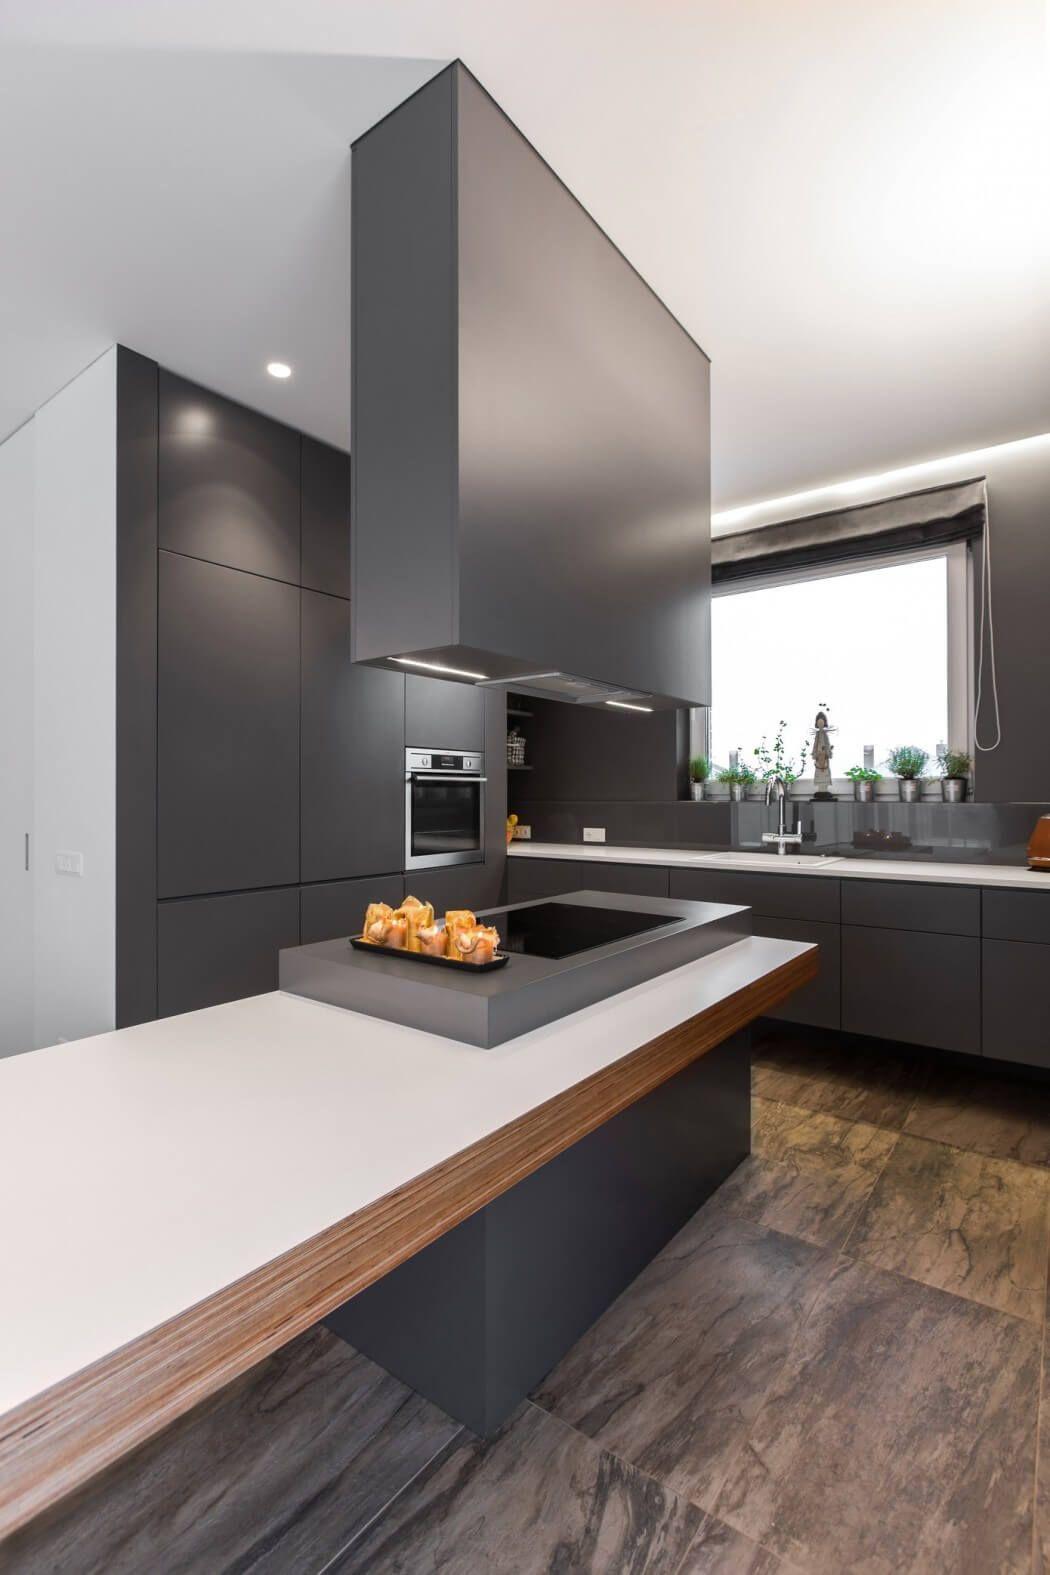 Pavilny Residence by YCL Studio   Cocina   Pinterest   Cocinas ...